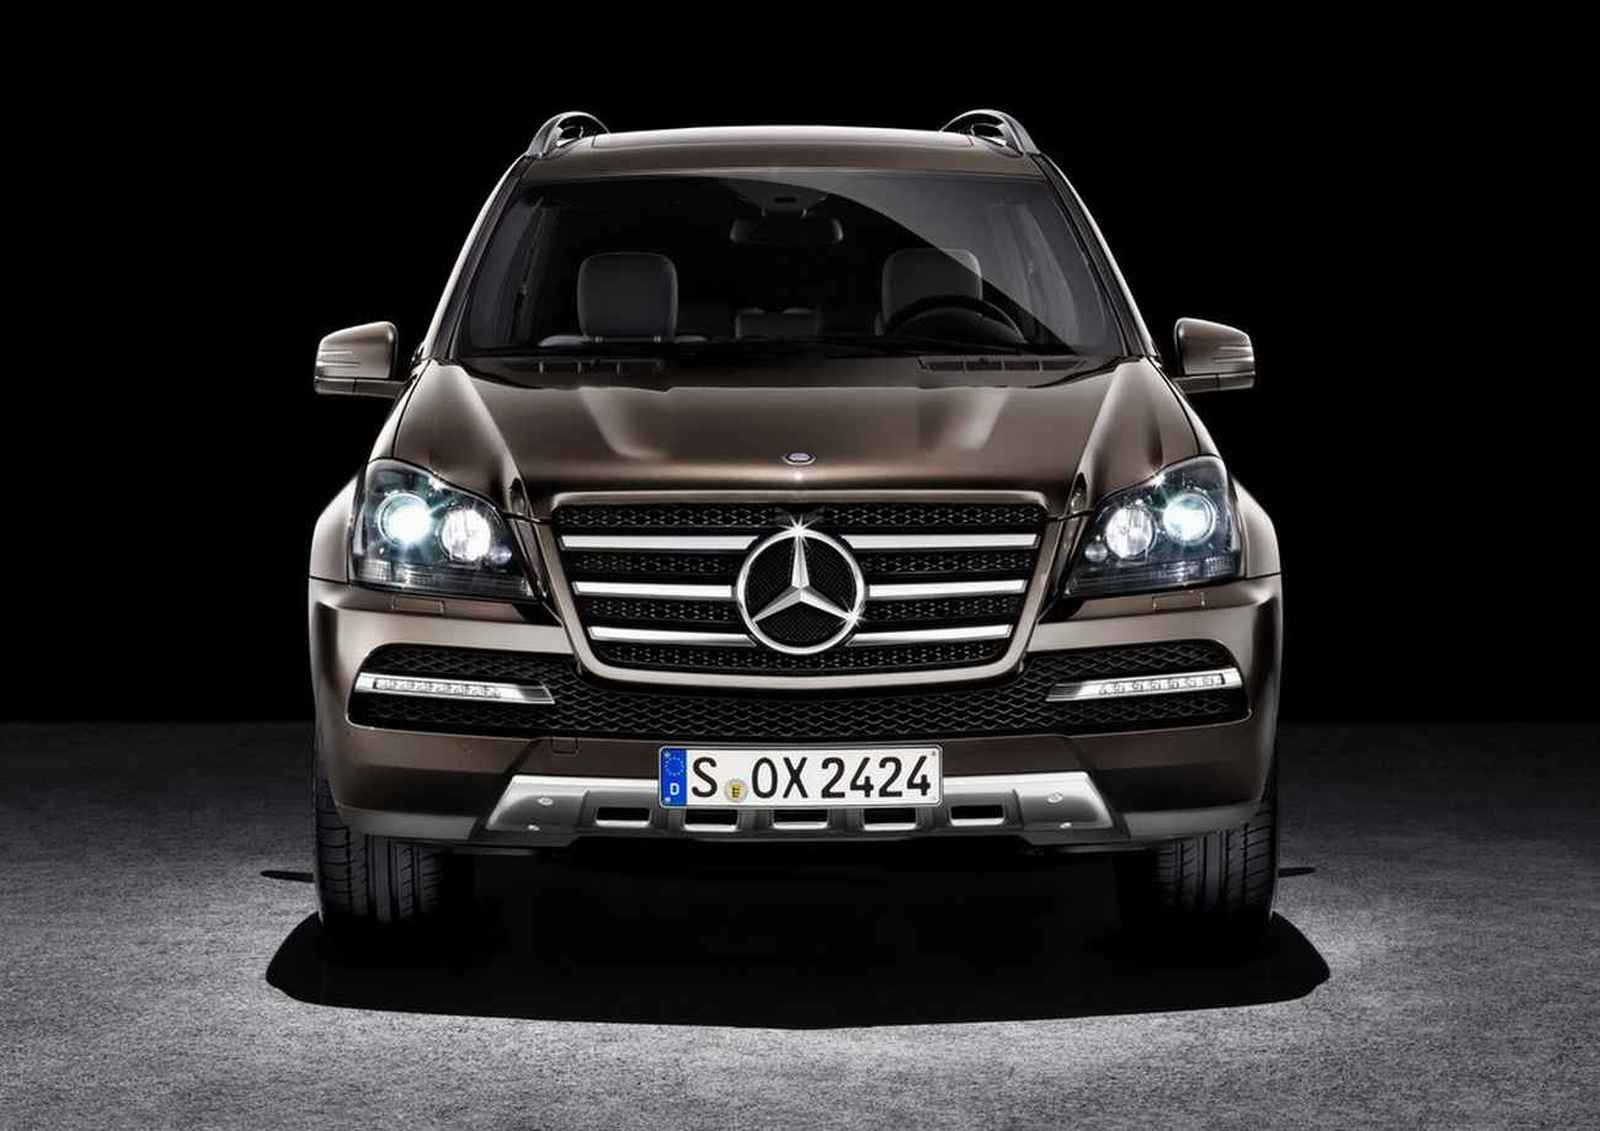 Mercedes Benz-ը կարտադրի աշխարհի ամենաշքեղ ամենագնացը՝ MayBach GL